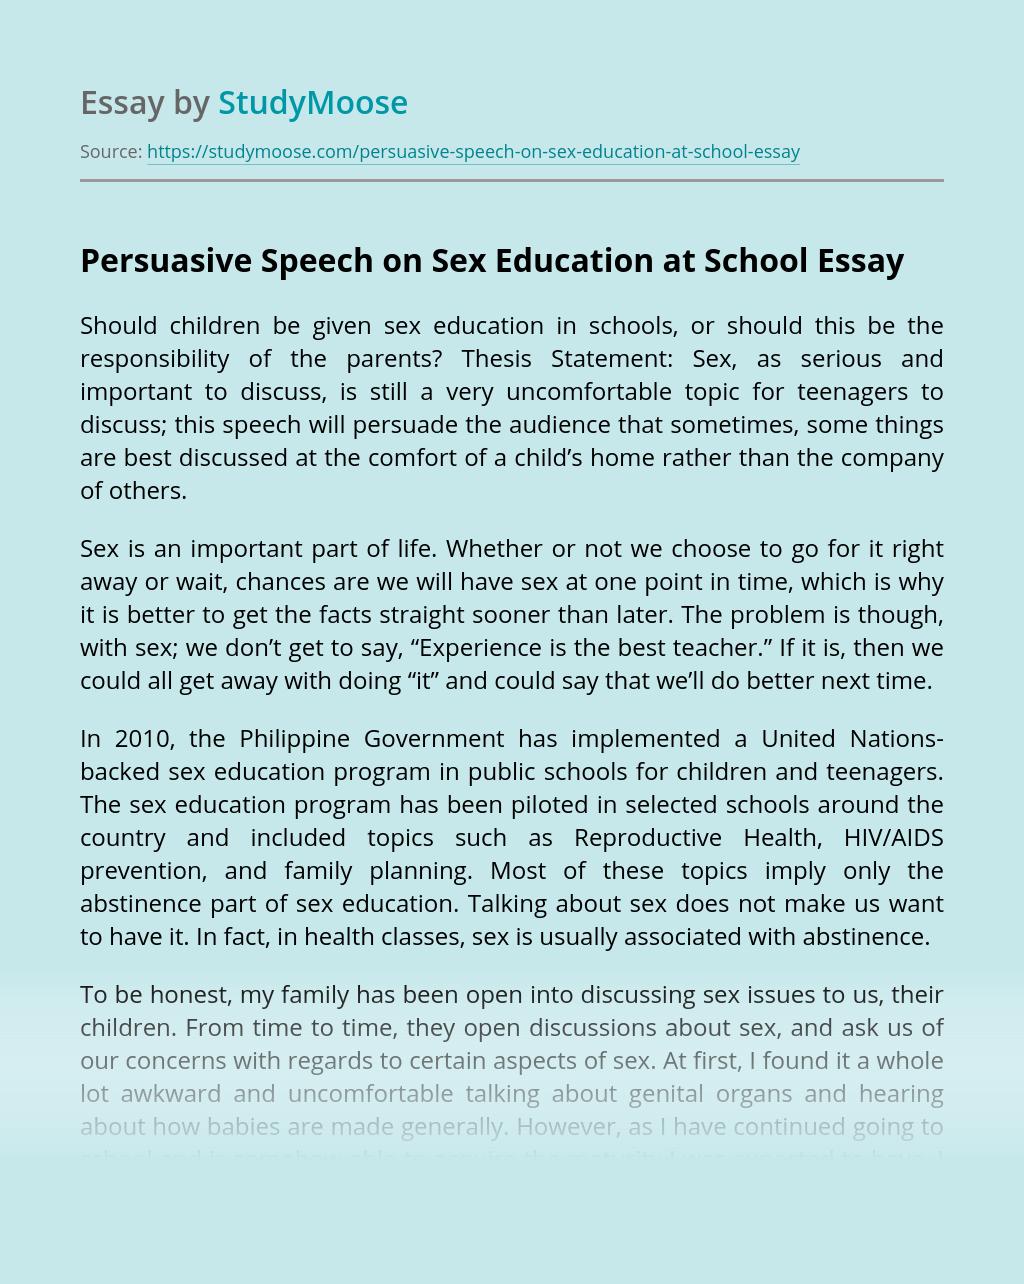 Persuasive Speech on Sex Education at School